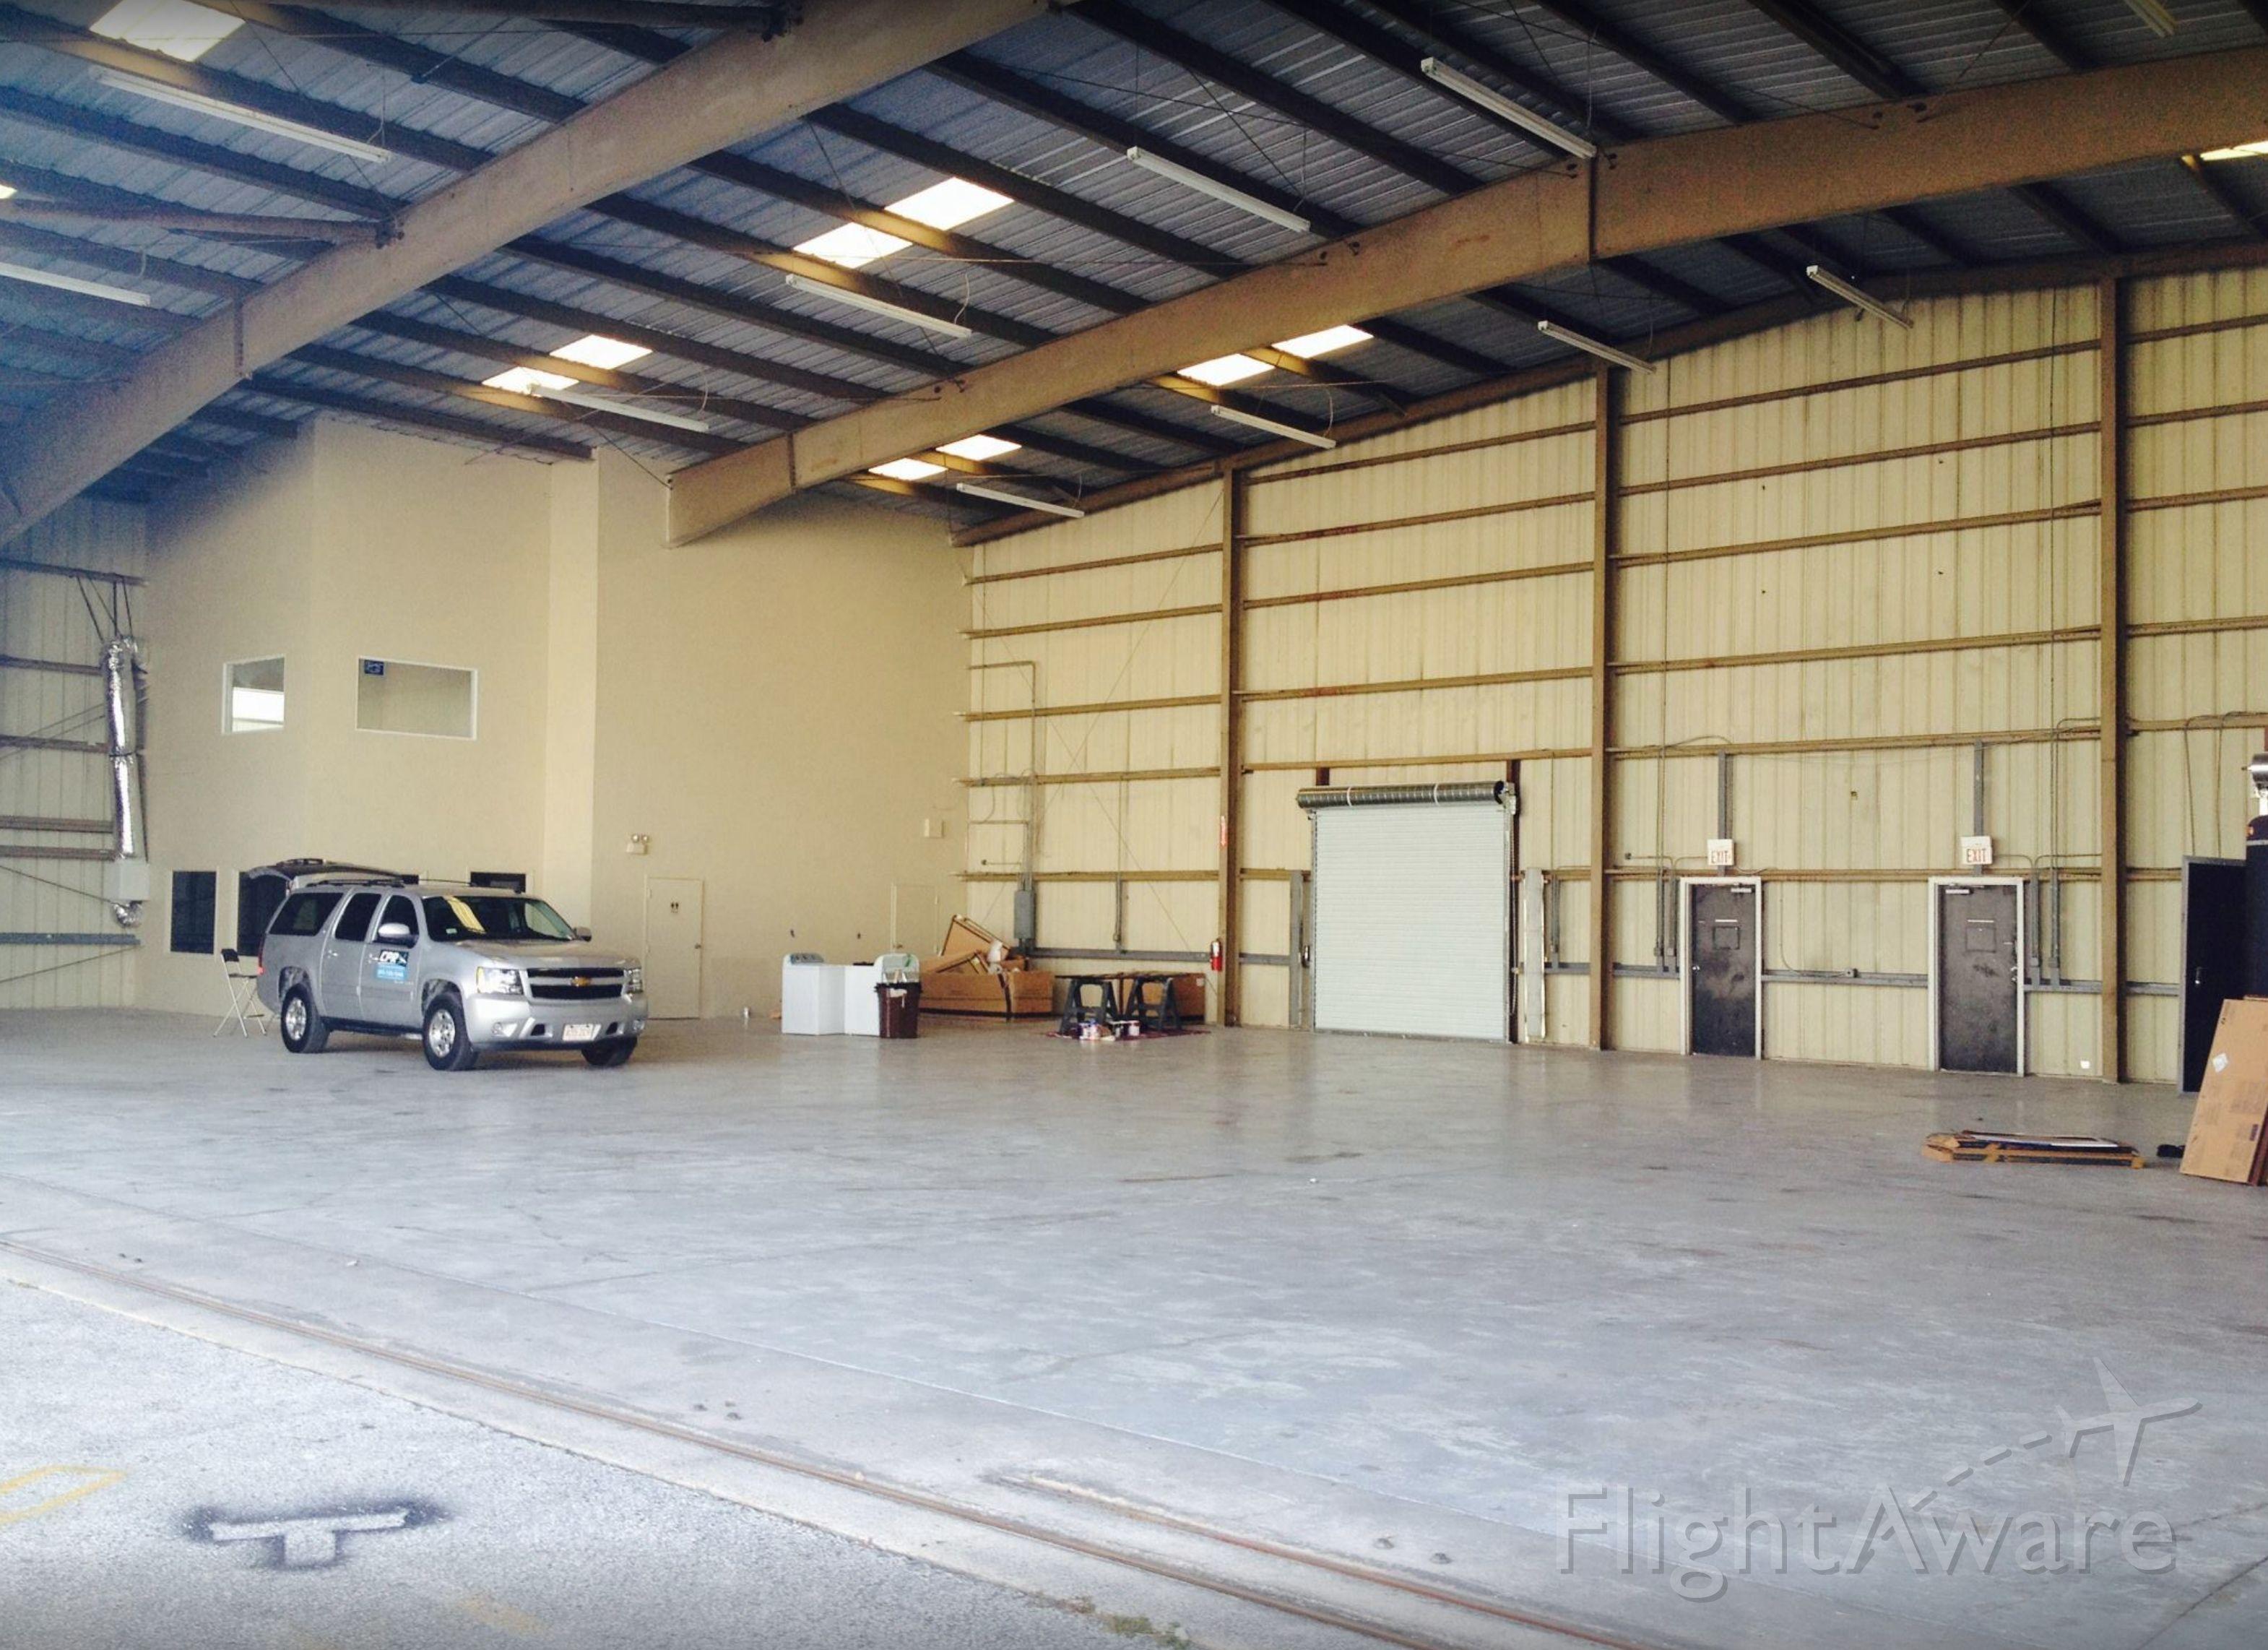 — — - CPR Aviation Window Repairs     Hangar Before we did our Magic. Gratitude 777 (813) 728-1346